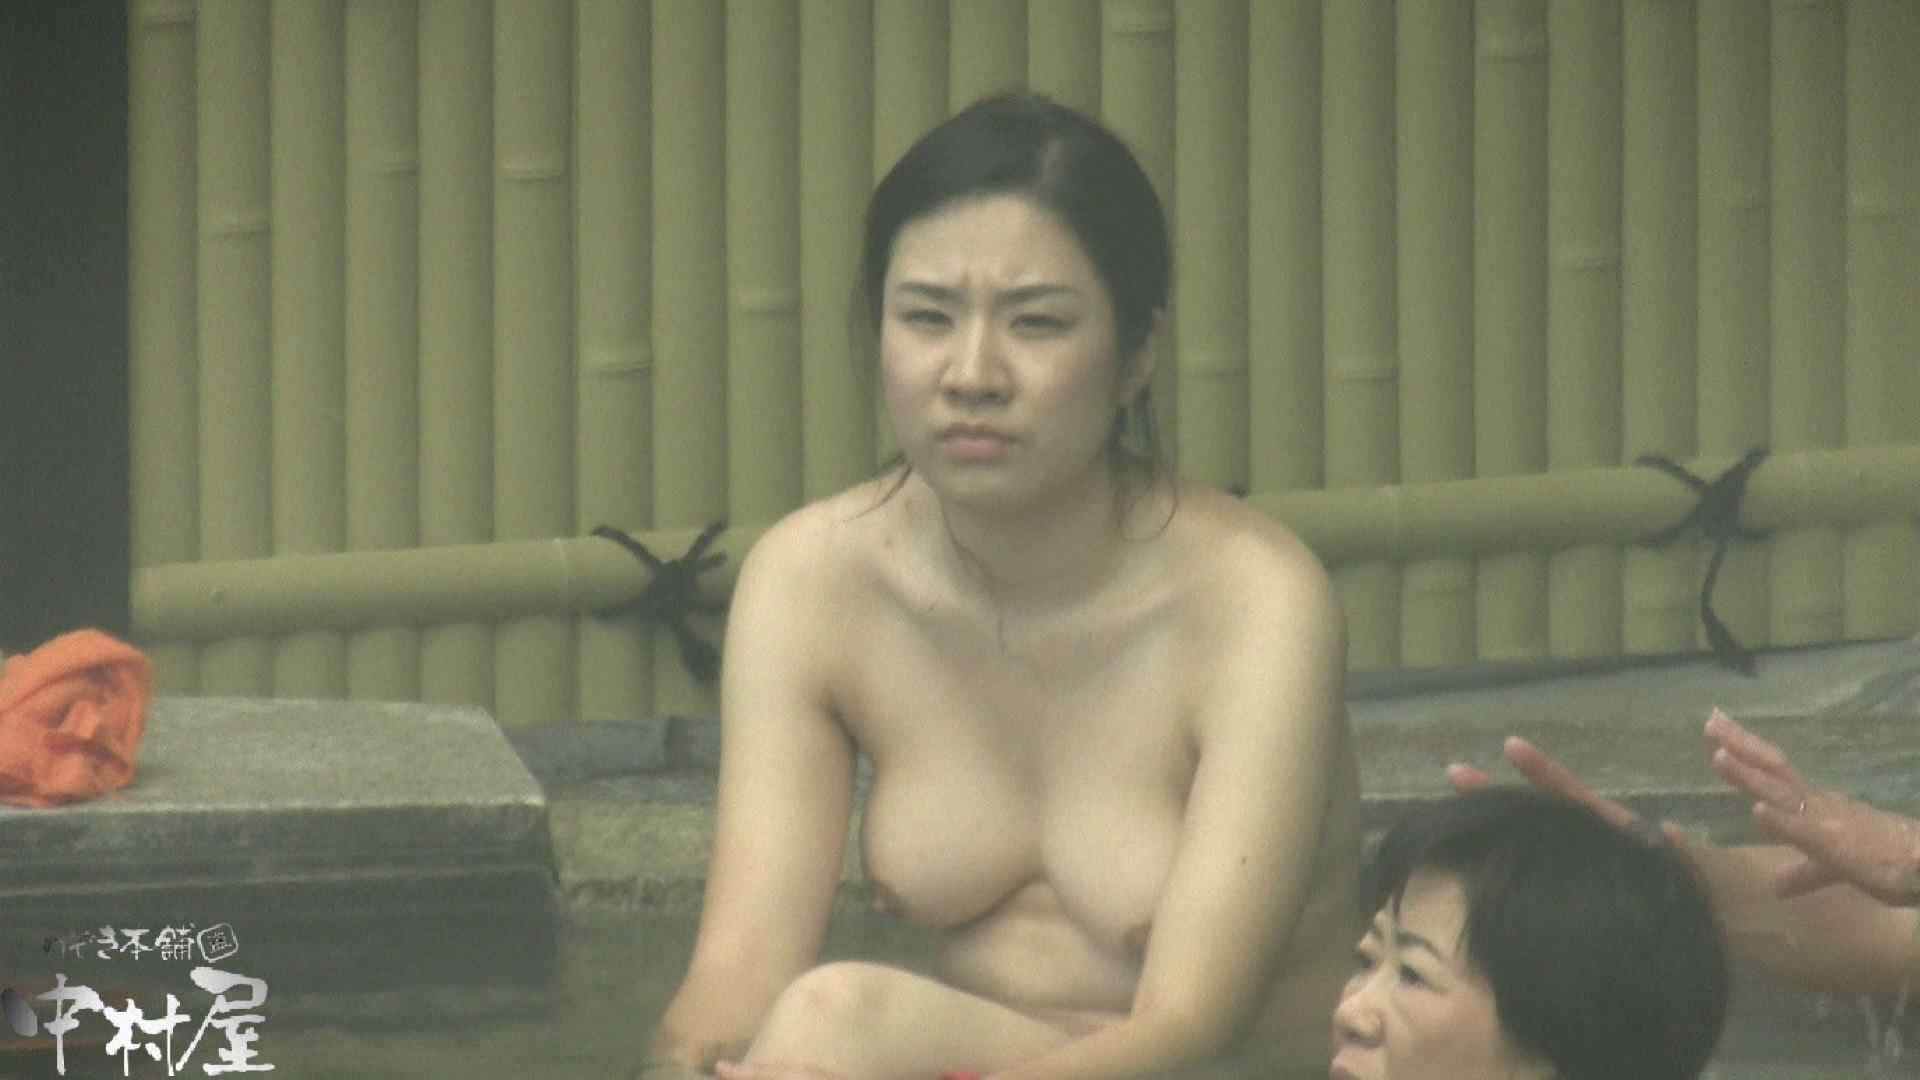 Aquaな露天風呂Vol.913 いやらしいOL アダルト動画キャプチャ 65連発 32